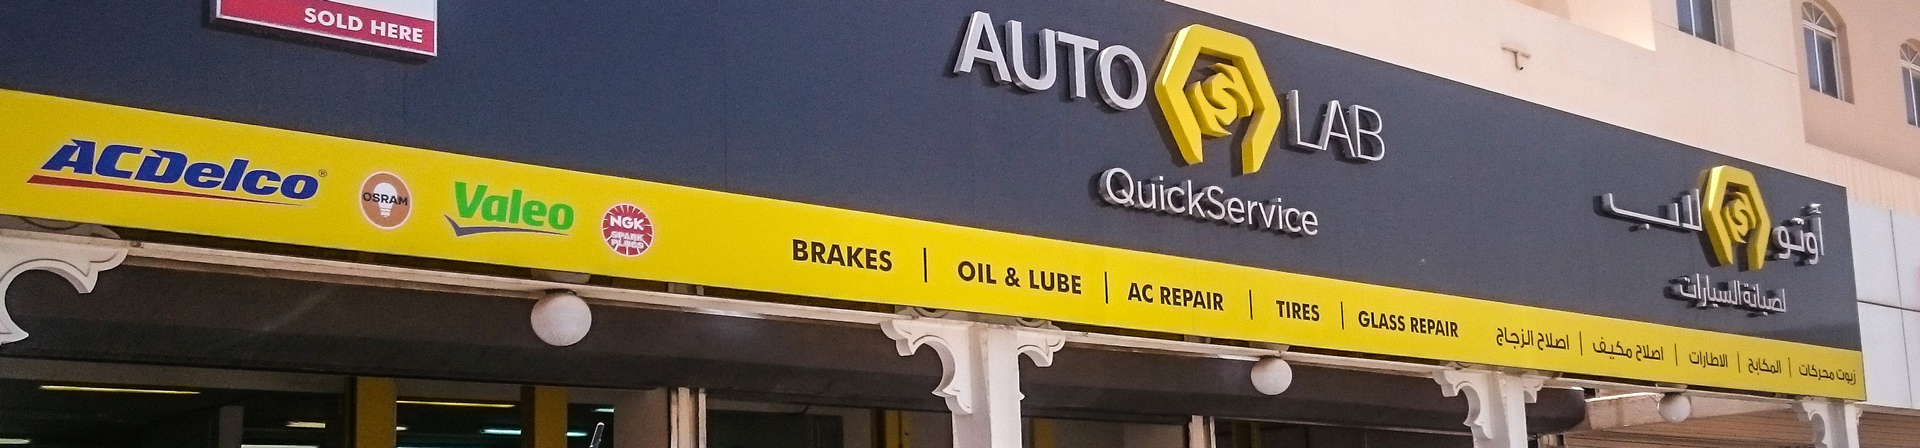 Autolab Banner